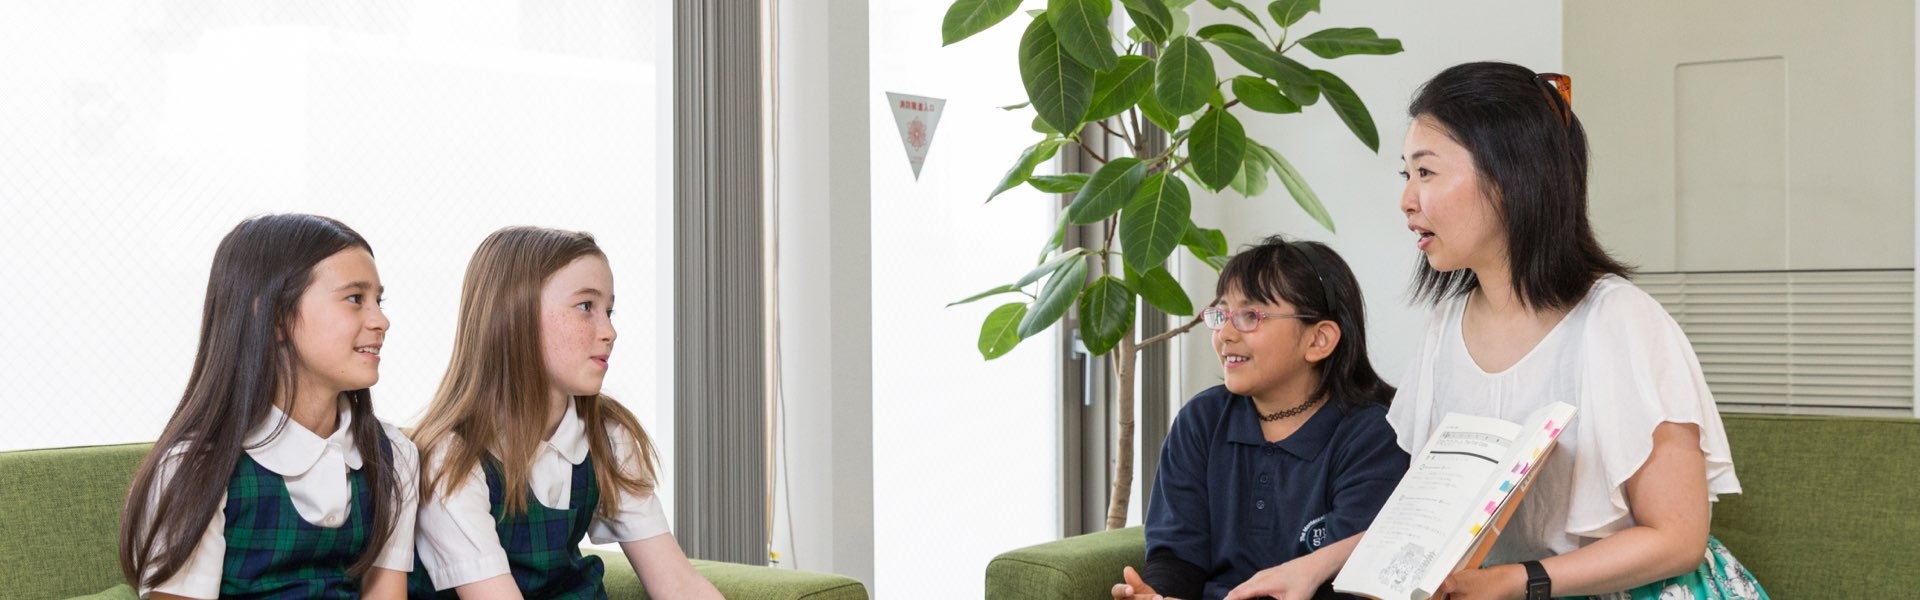 mariko-koide-小出-万里子-chief-coordinator-teaching-japanese-to-young-kids